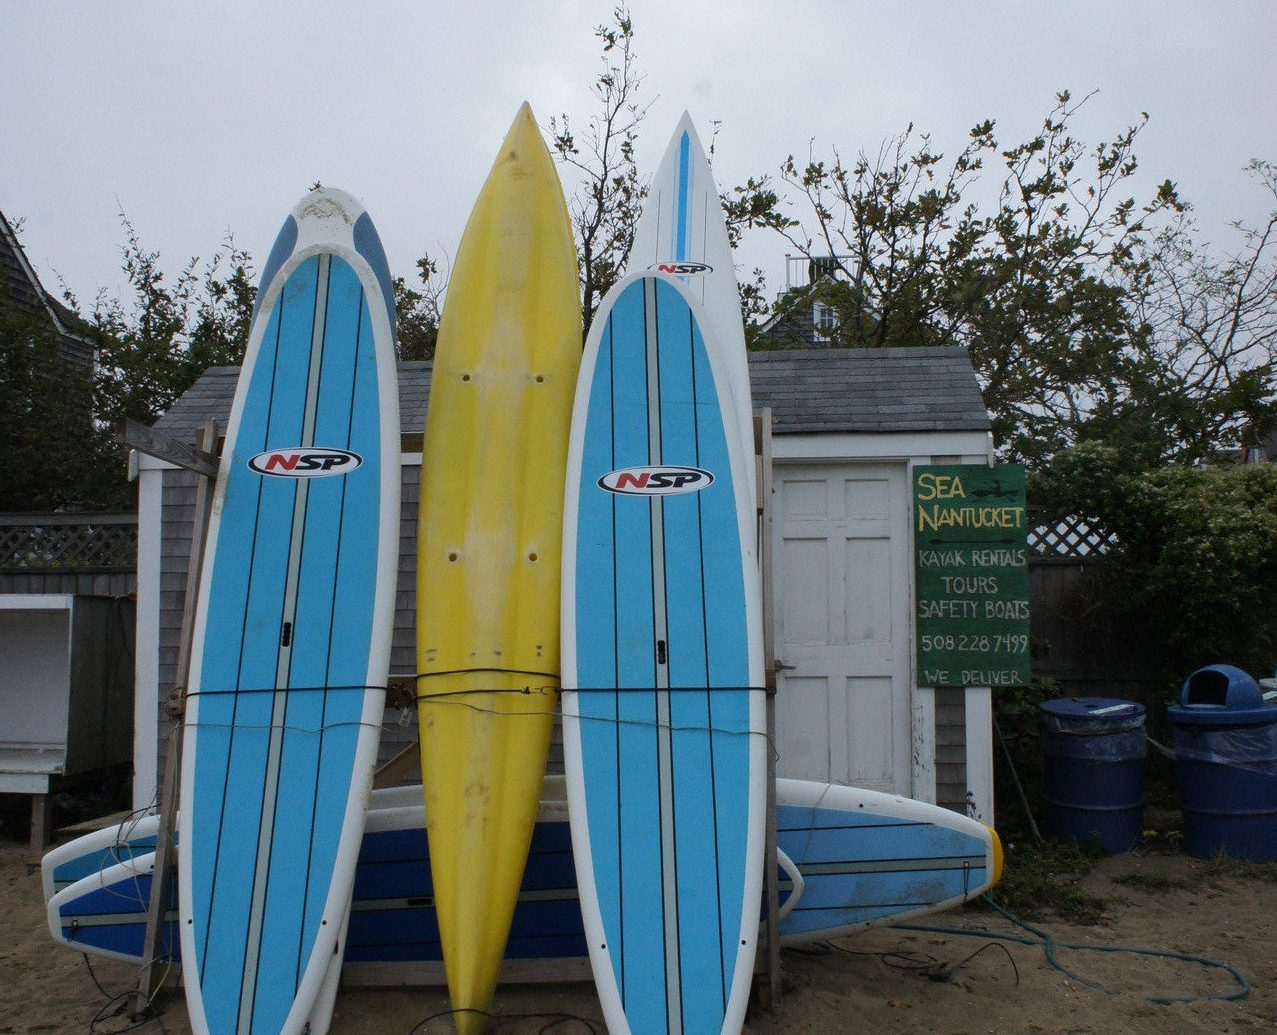 Trip Ideas surfing outdoor ground blue Beach man made object sand surfboard wheel surfing equipment and supplies Playground vehicle boarding sandy